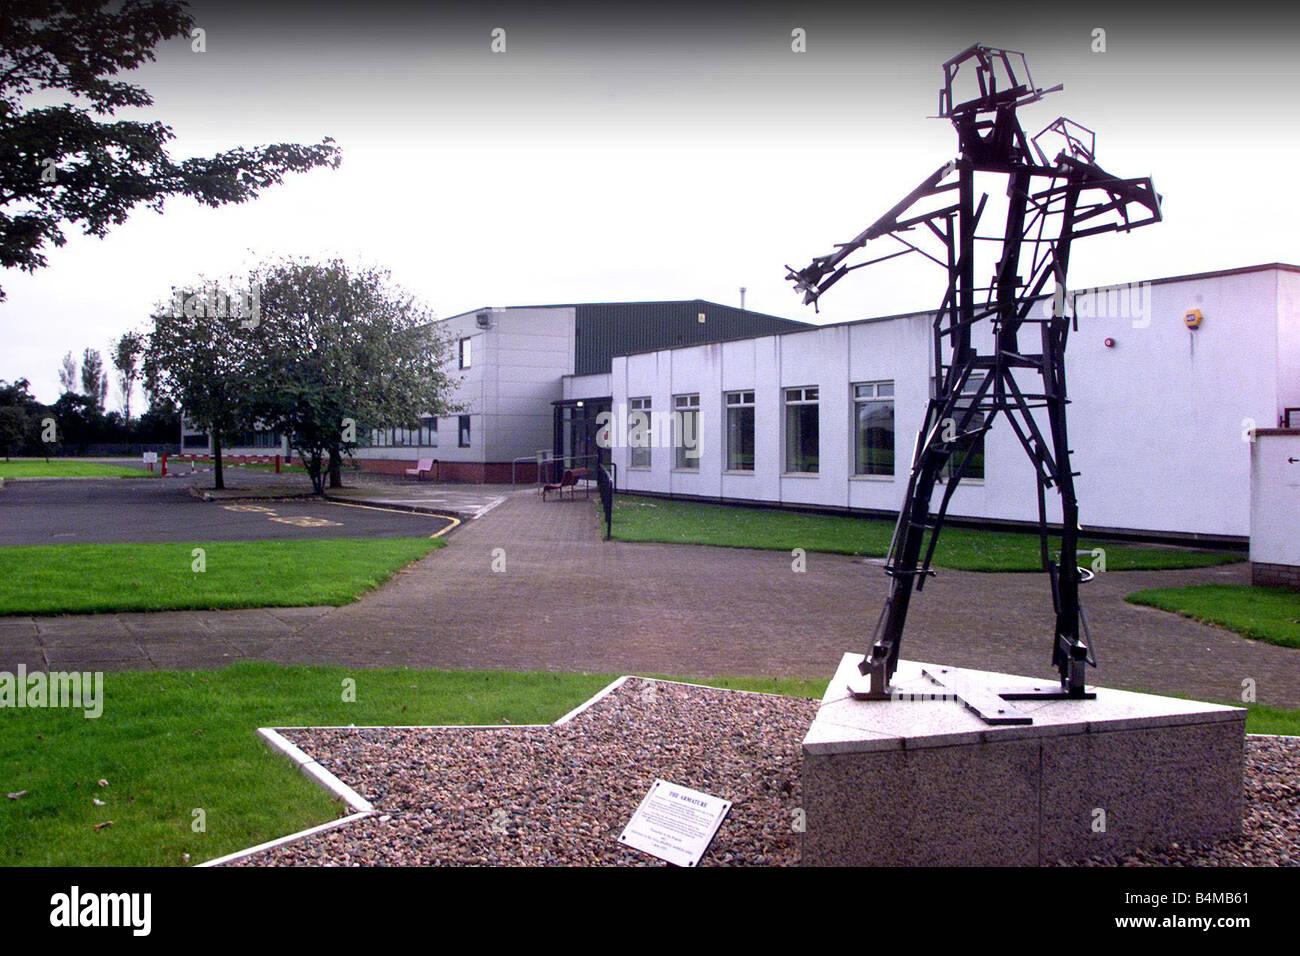 Northern Ireland Fire Brigade Training Centre in Belfast August 2002 - Stock Image